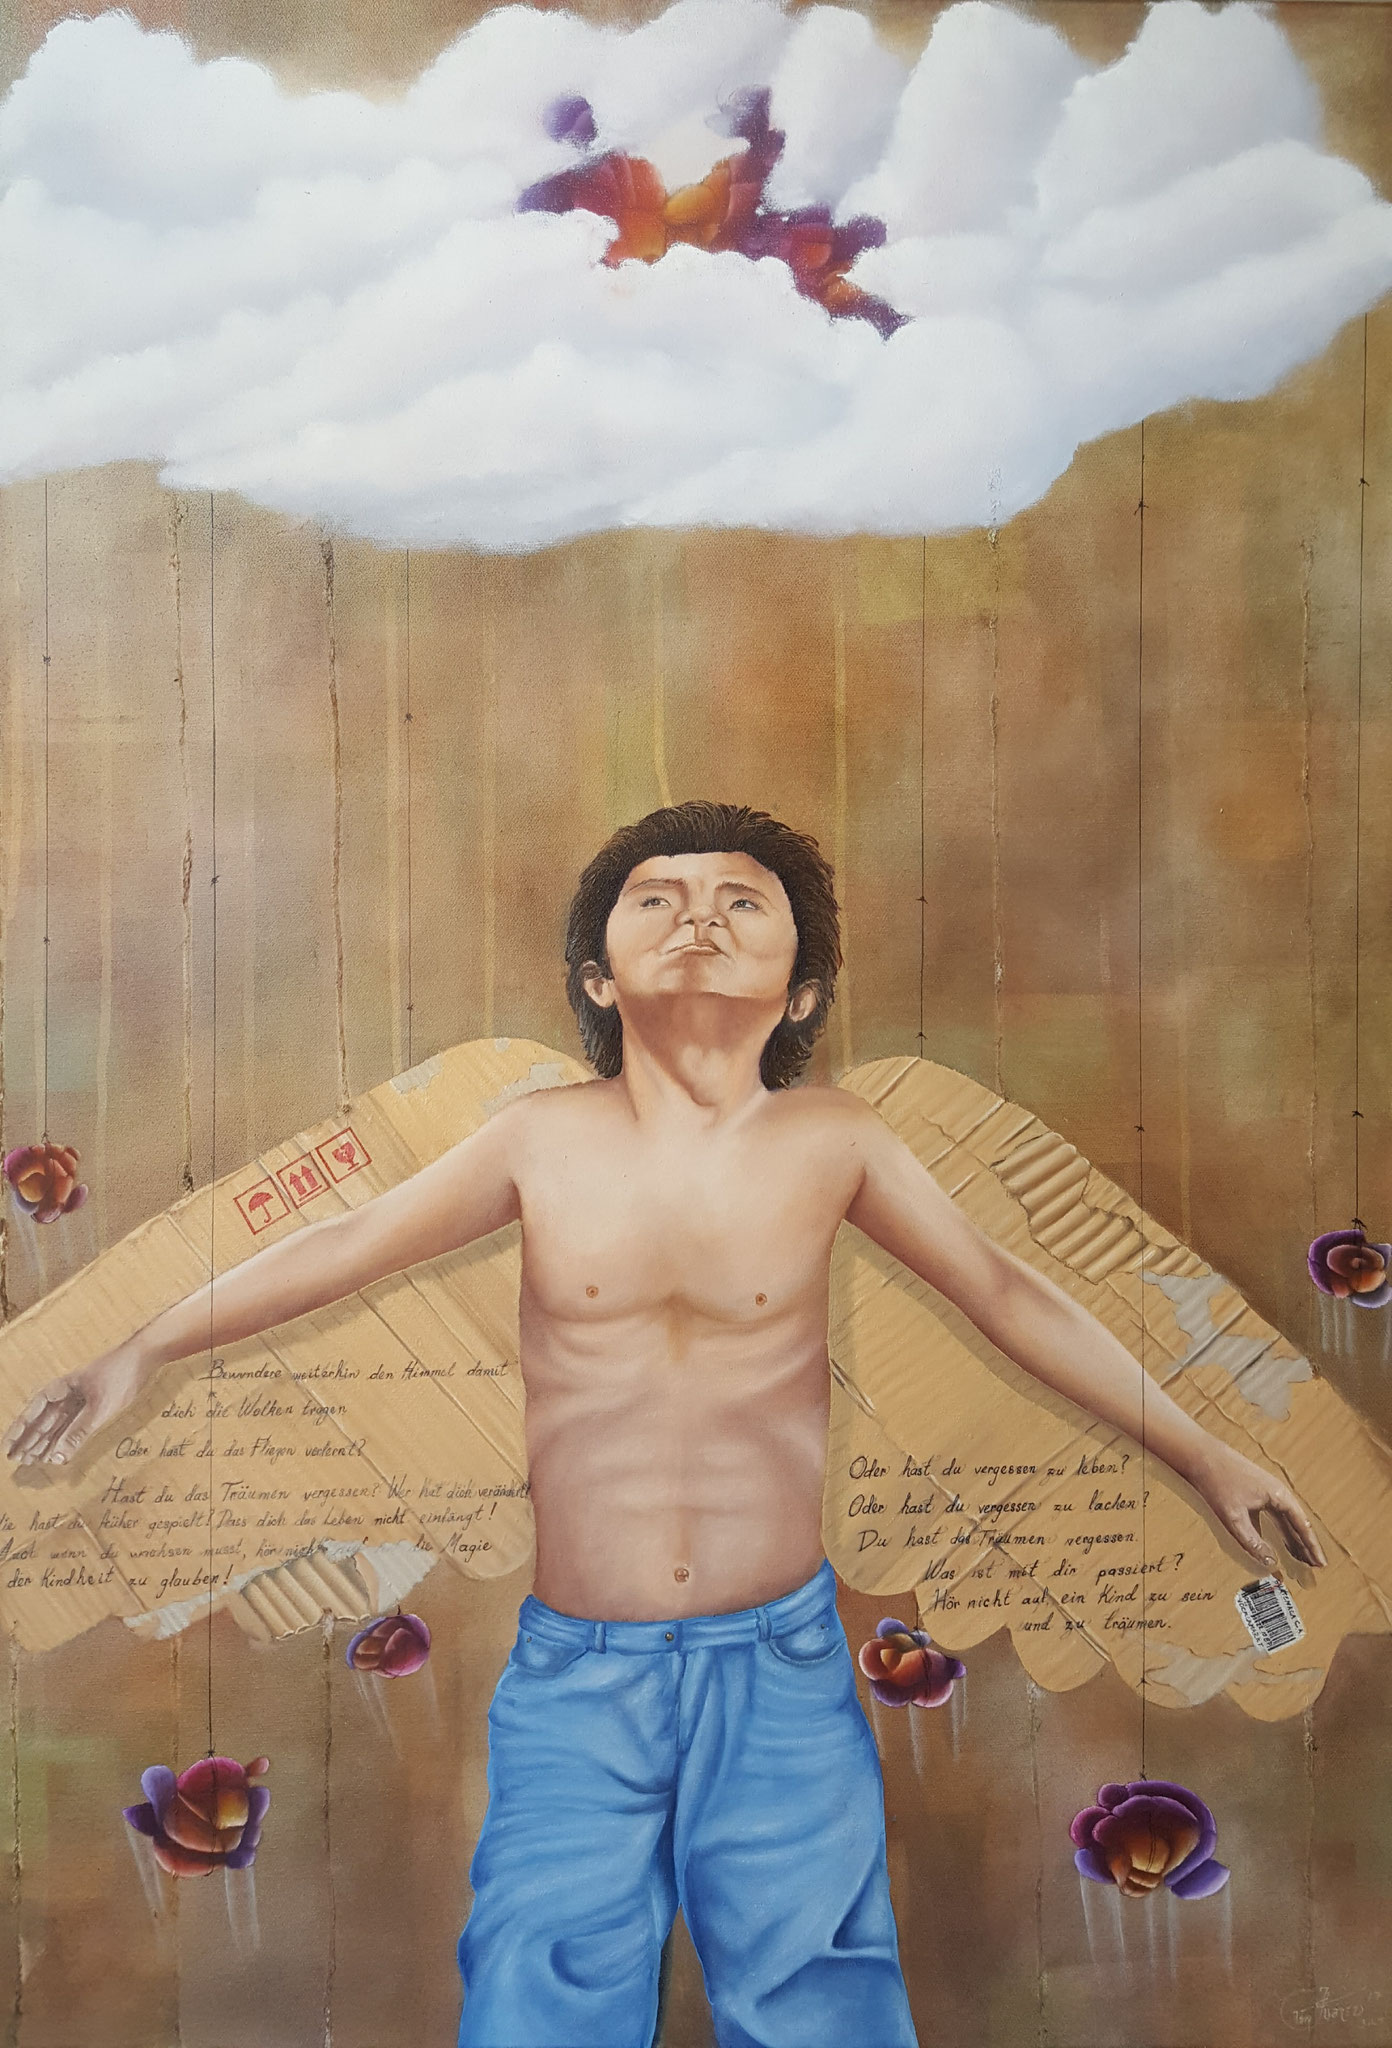 Cargador de sueños I, 2016, 70 x 100 cm, Óleo sobre lienzo